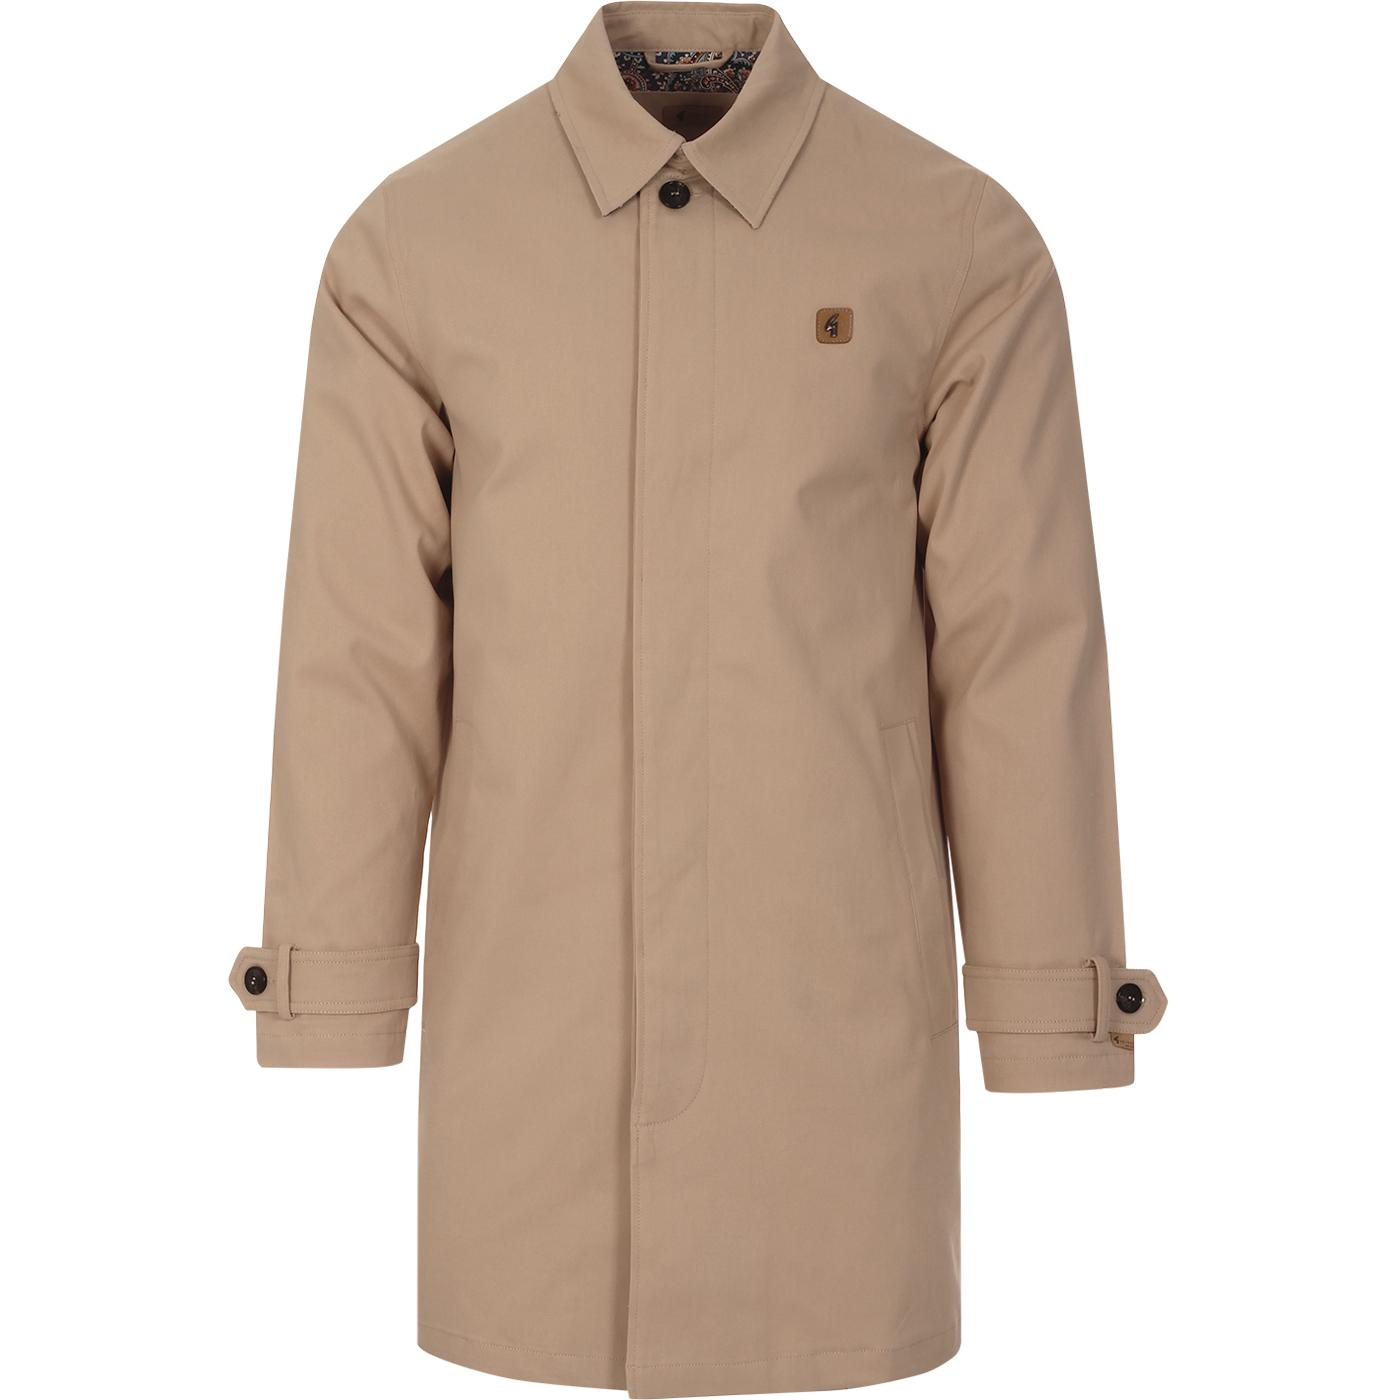 Houghton GABICCI VINTAGE 60s Mod Mac Jacket (O)